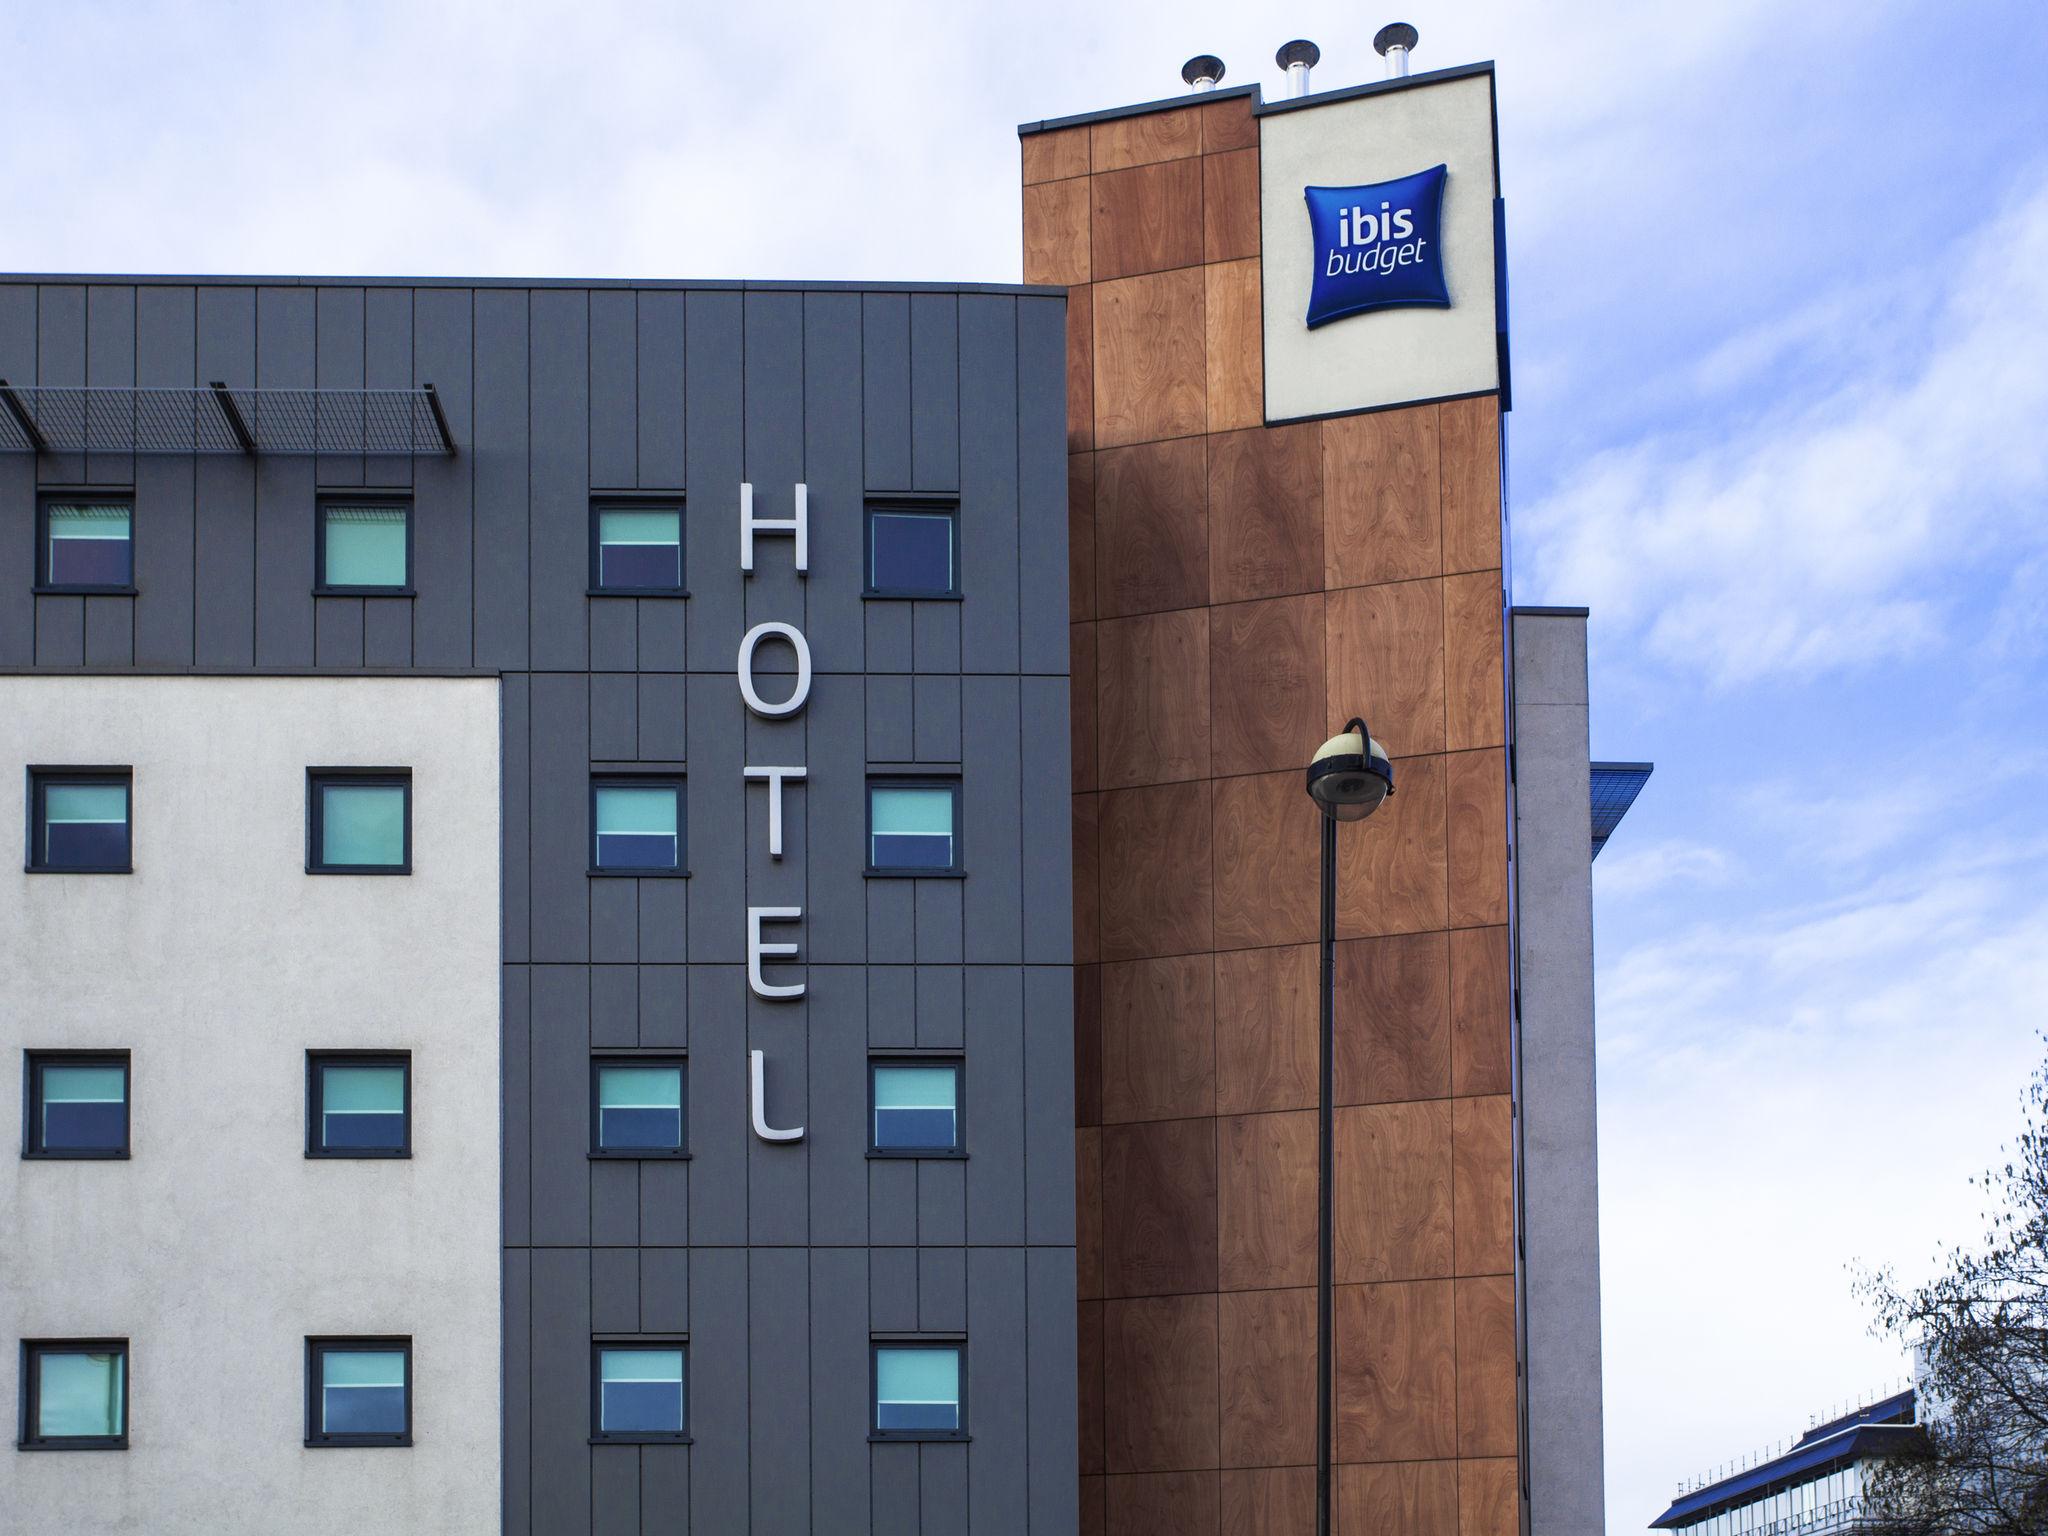 Hotel Ibis Budget London Hounslow